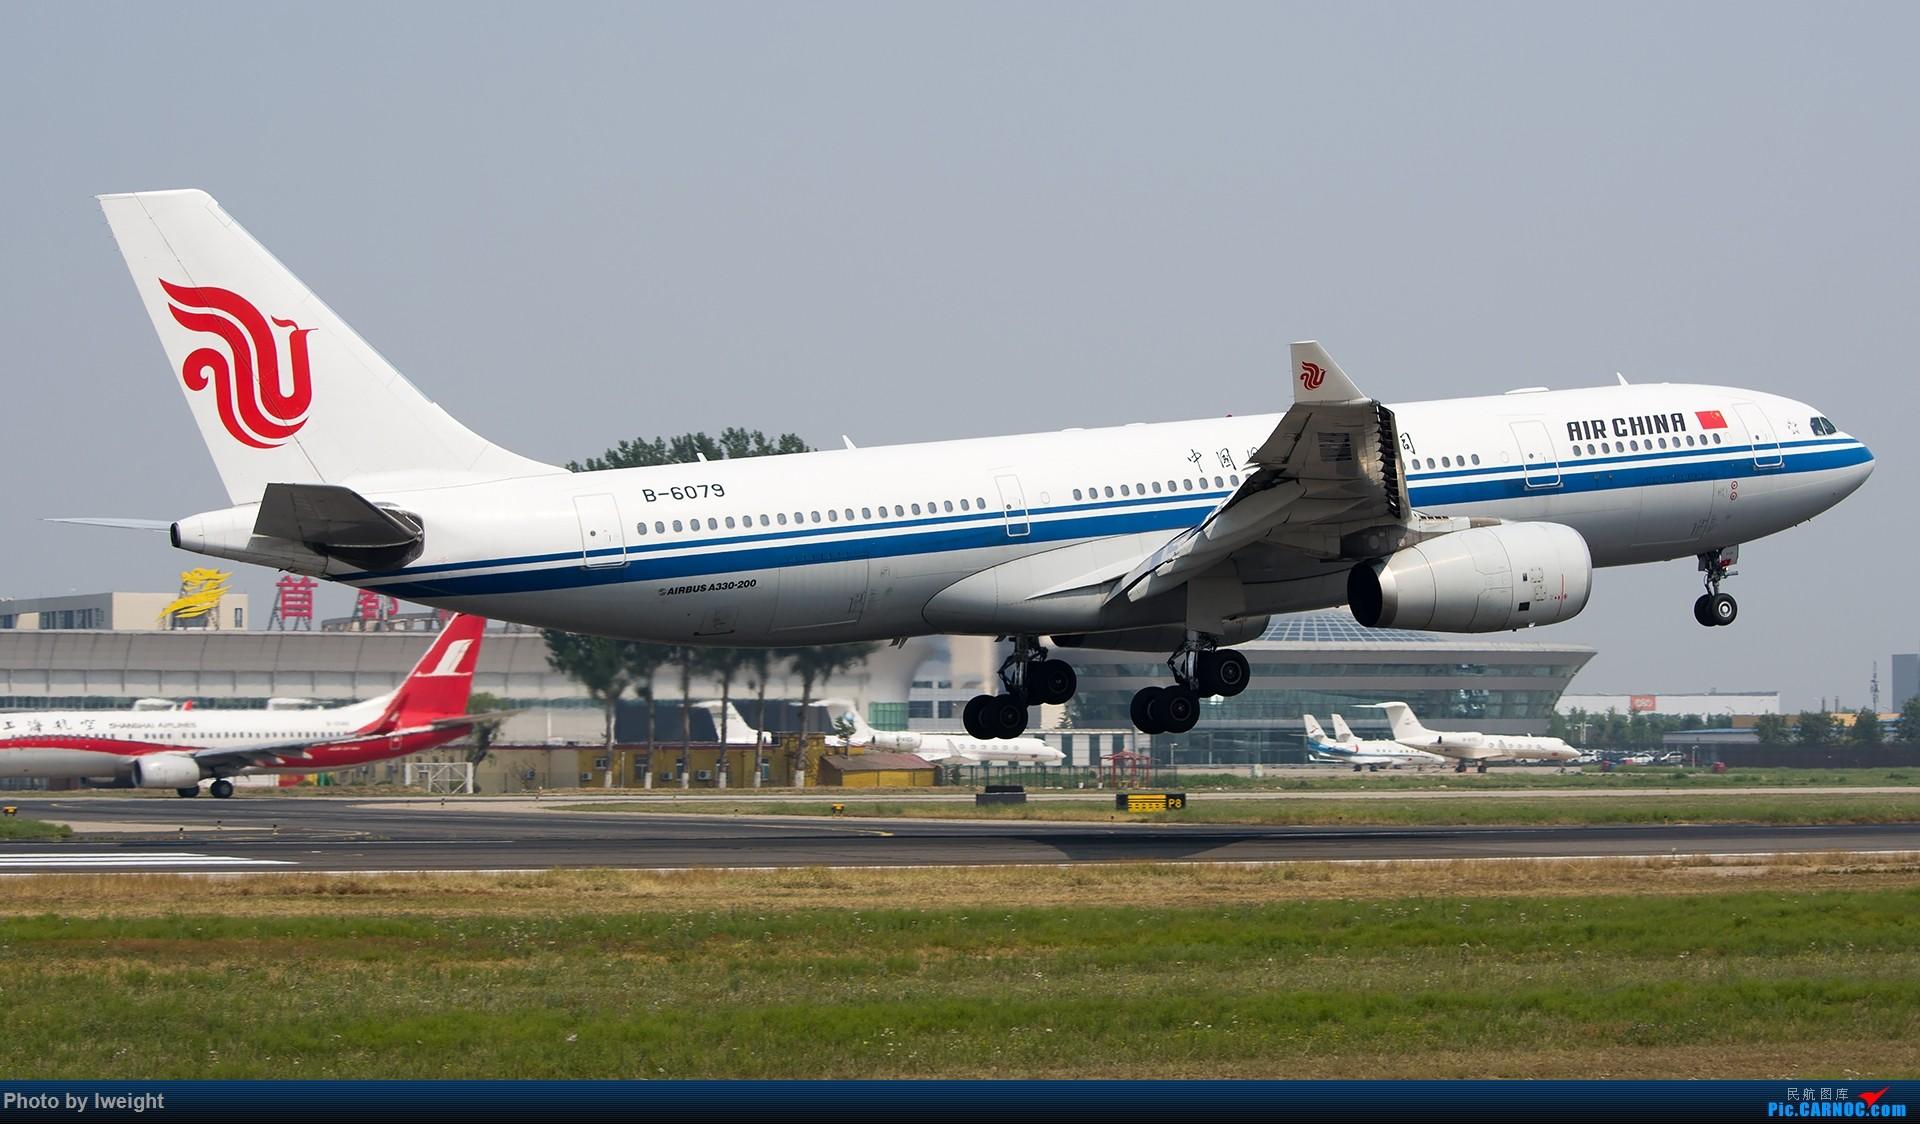 Re:[原创]周末帝都霾天拍机,凑合看看吧【2015-5-23】 AIRBUS A330-200 B-6079 中国北京首都国际机场